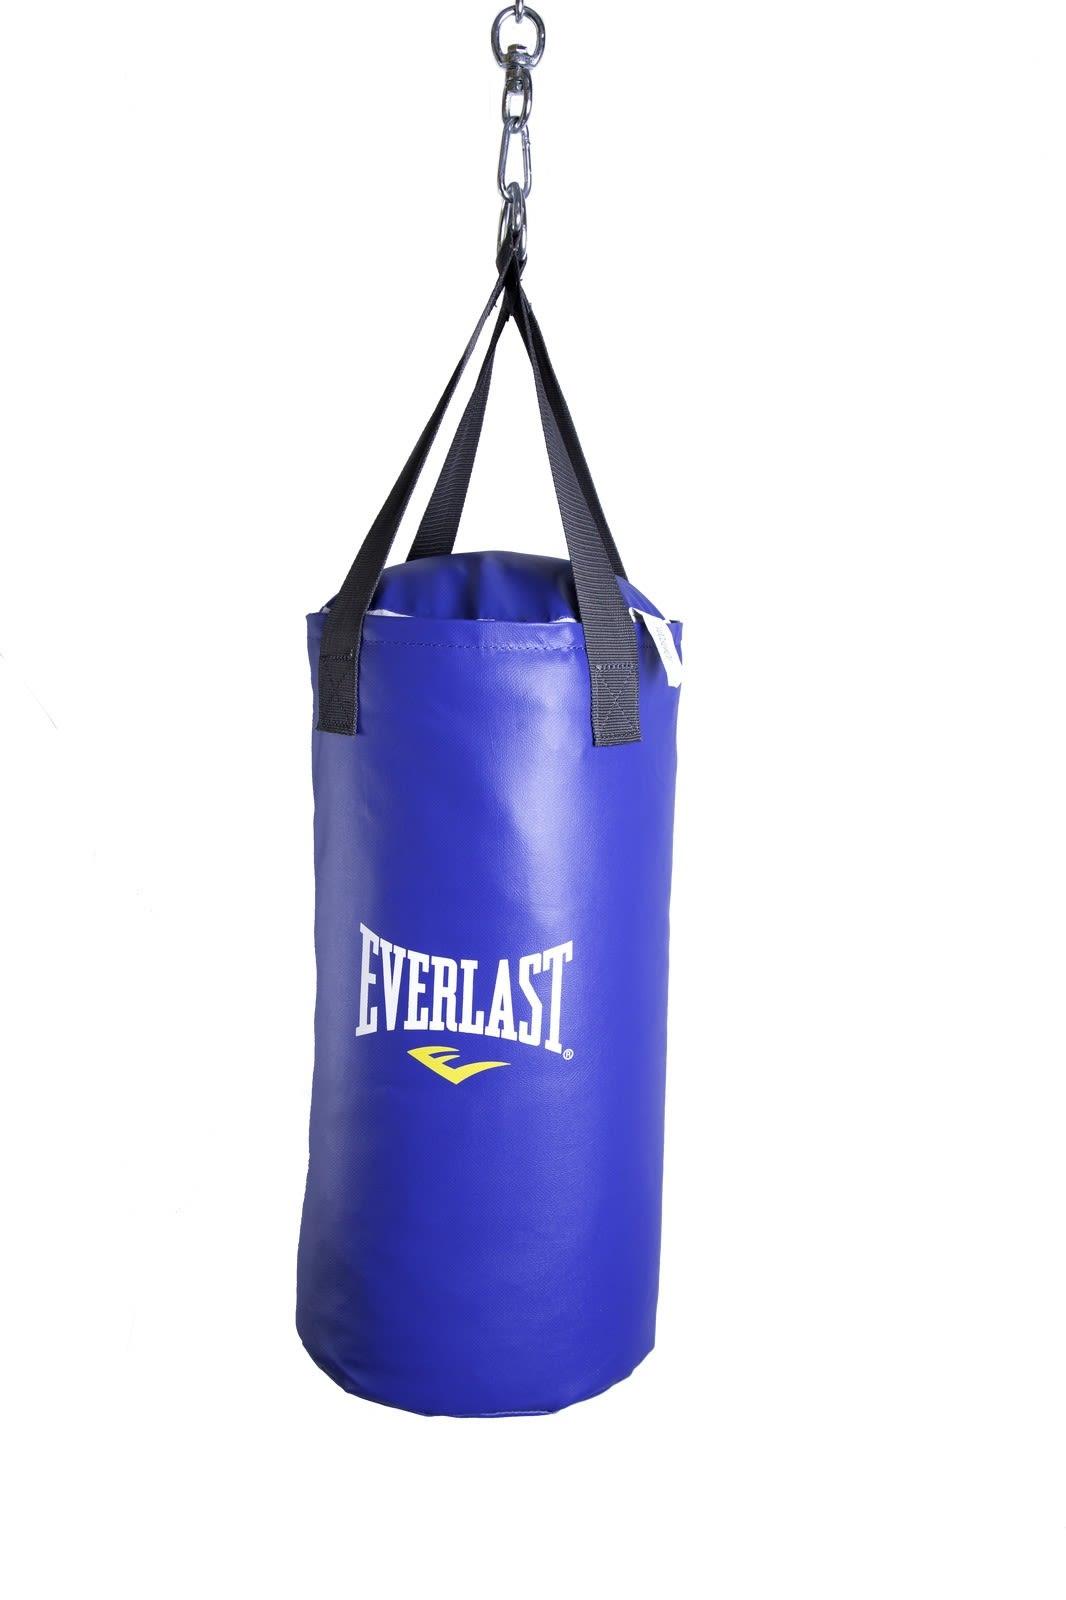 Saco Punchingbag Everlast 0.55 mt